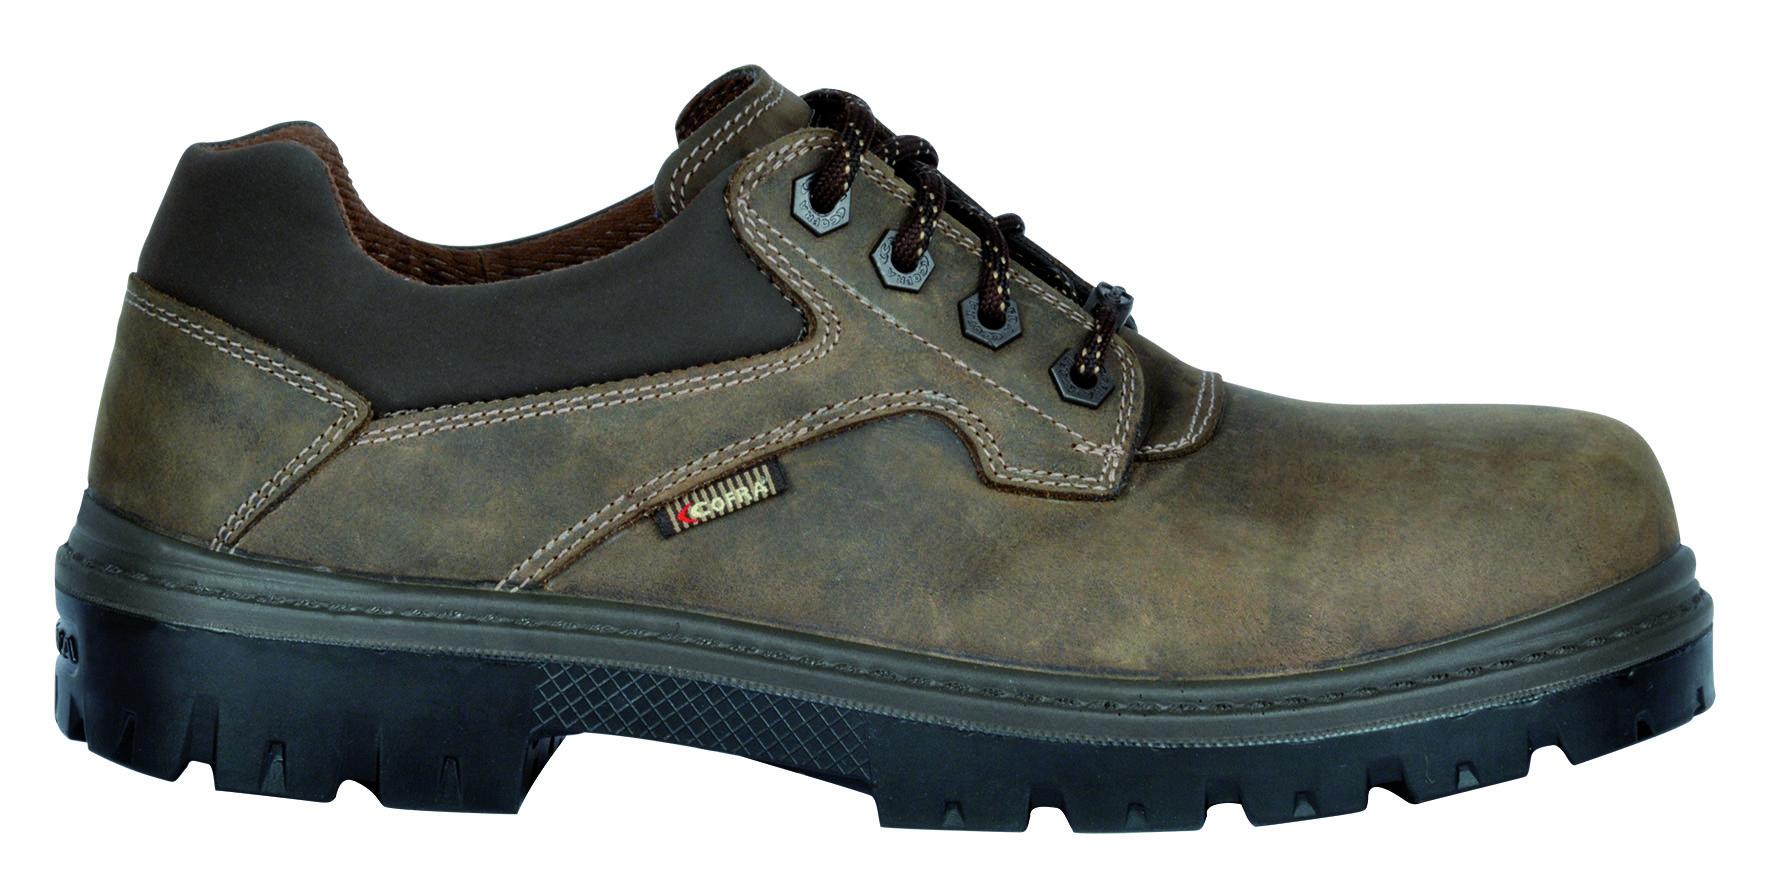 COFRA TERAINA S3 SRC, Arbeits Berufs Sicherheits Schuhe, Halbschuhe, braun